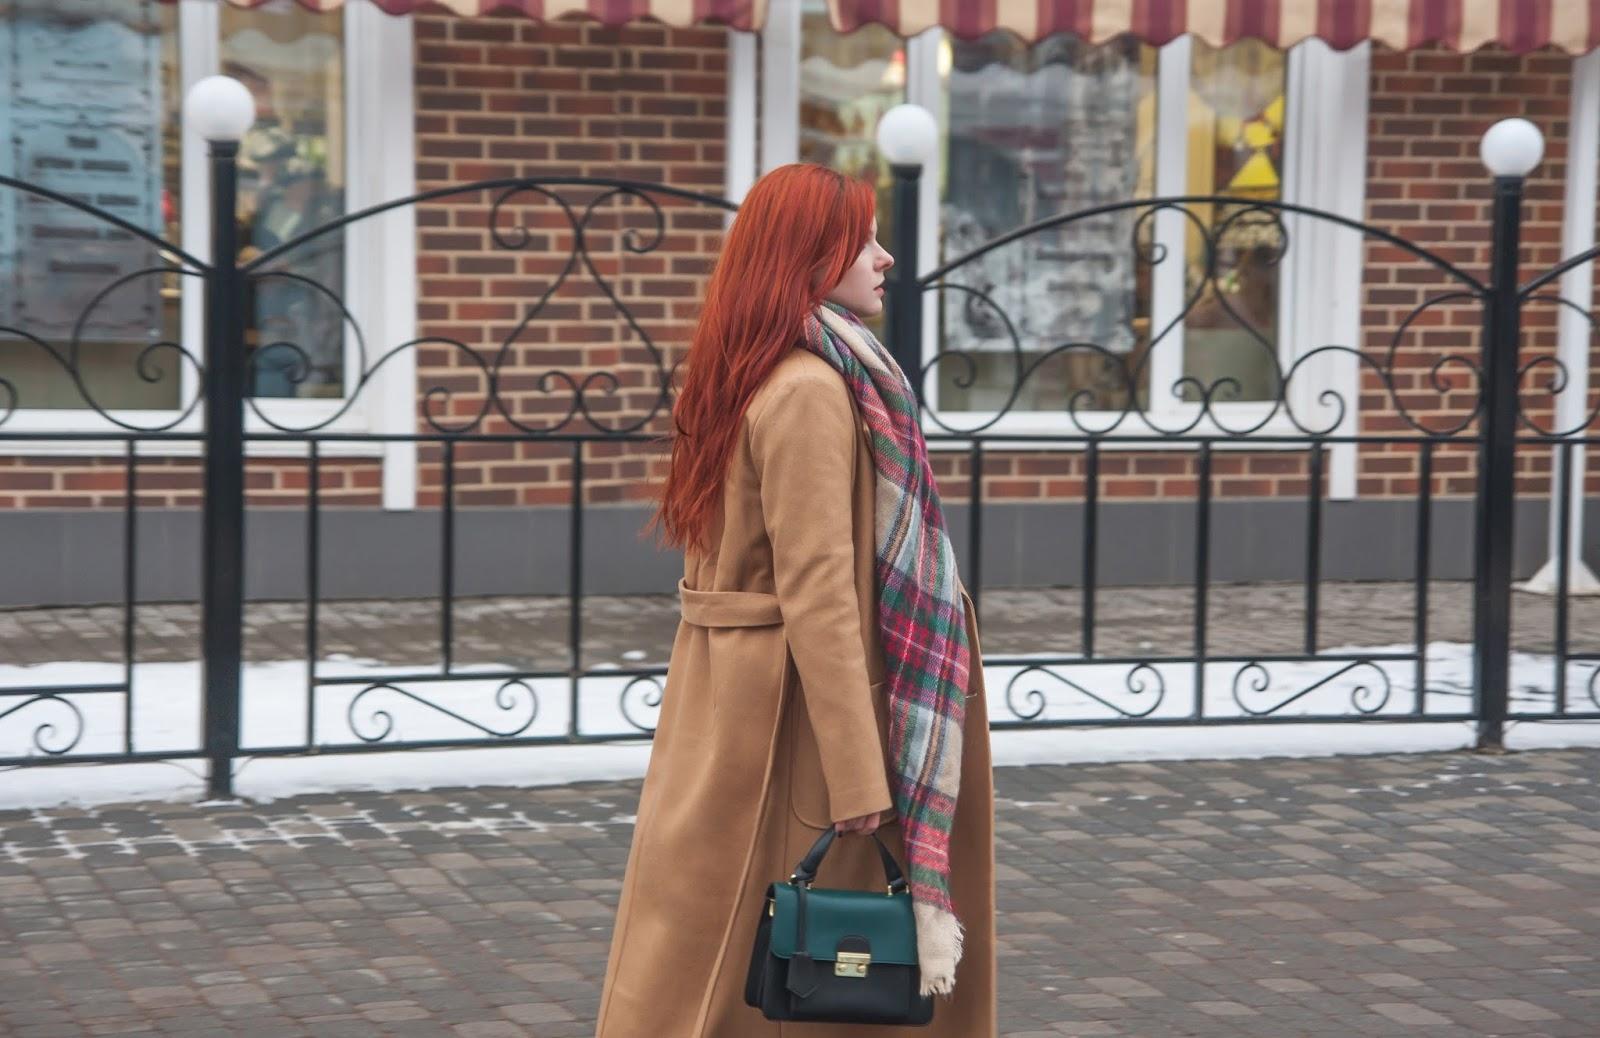 http://www.recklessdiary.ru/2017/12/kto-takie-blogery-kak-pravilno-pishetsya-bloger-kak-raskrutit-blog.html